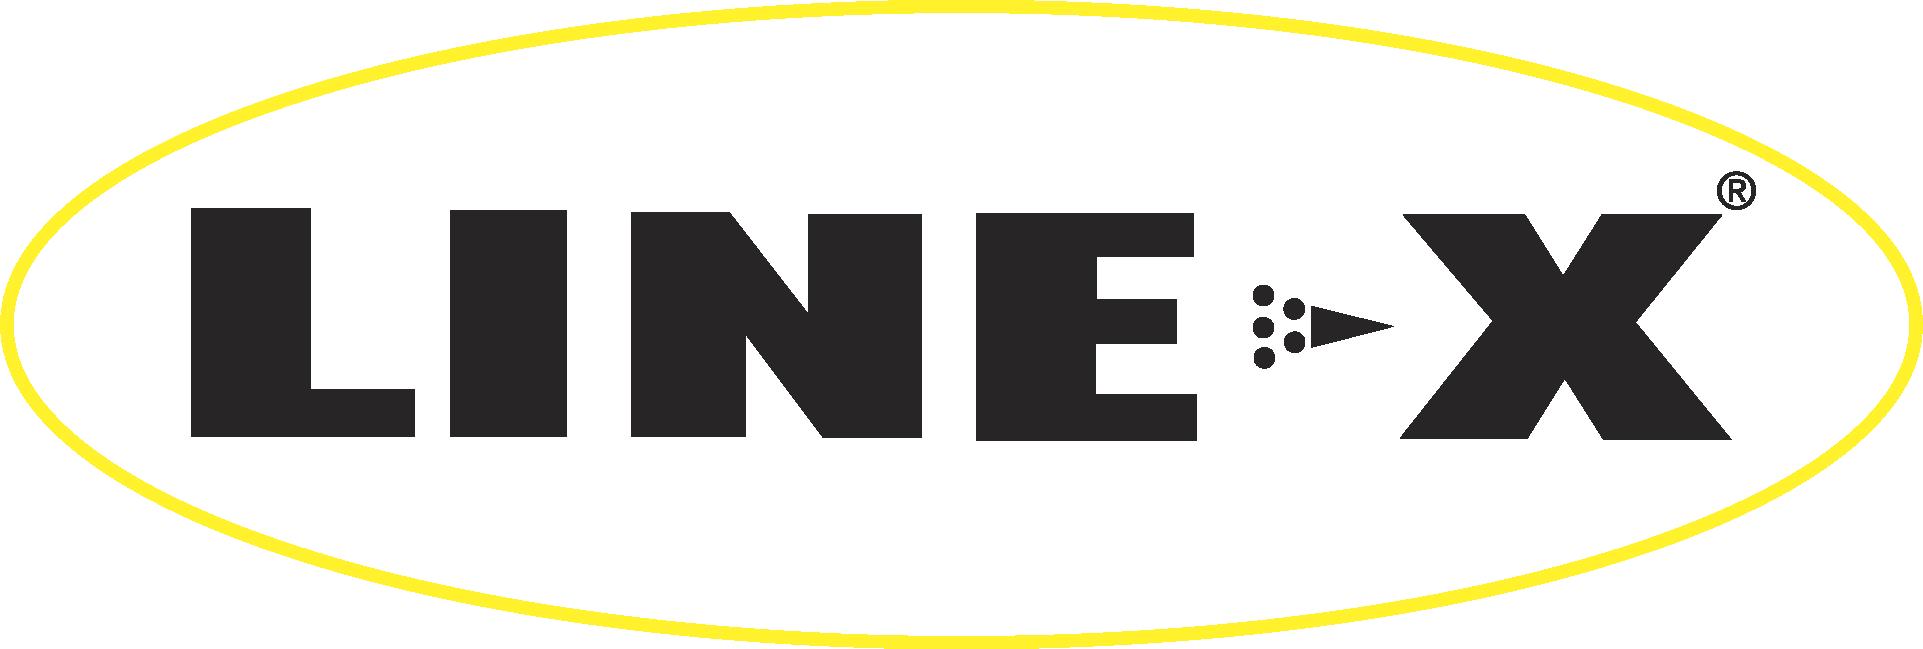 line_prot_coat.png